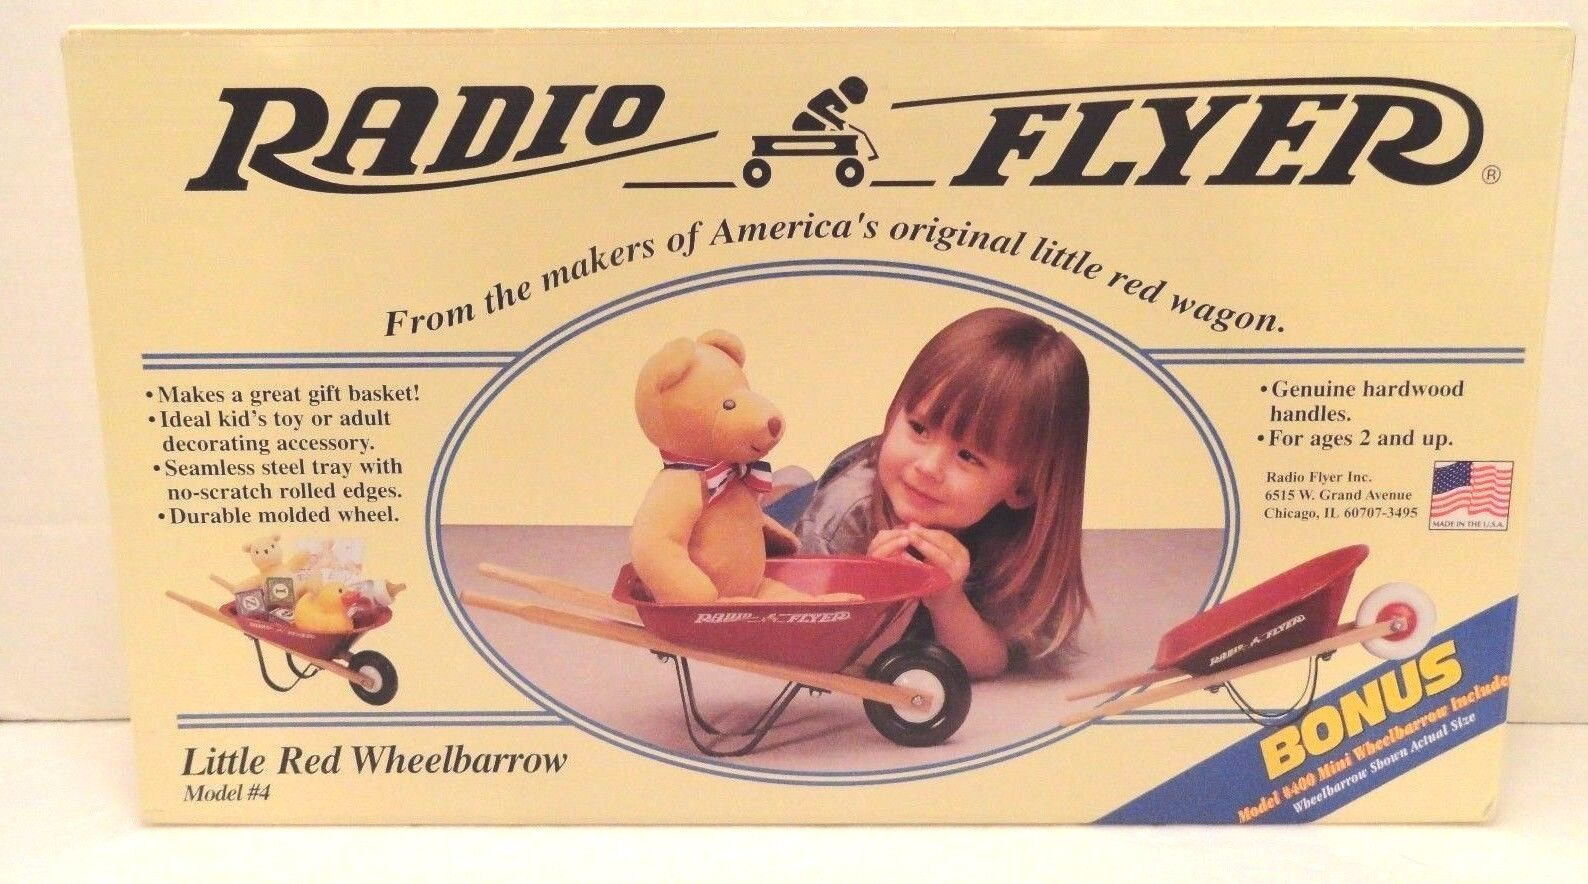 RADIO RADIO RADIO FLYER WHEELBARROW BONUS MINI NEW 3024ac